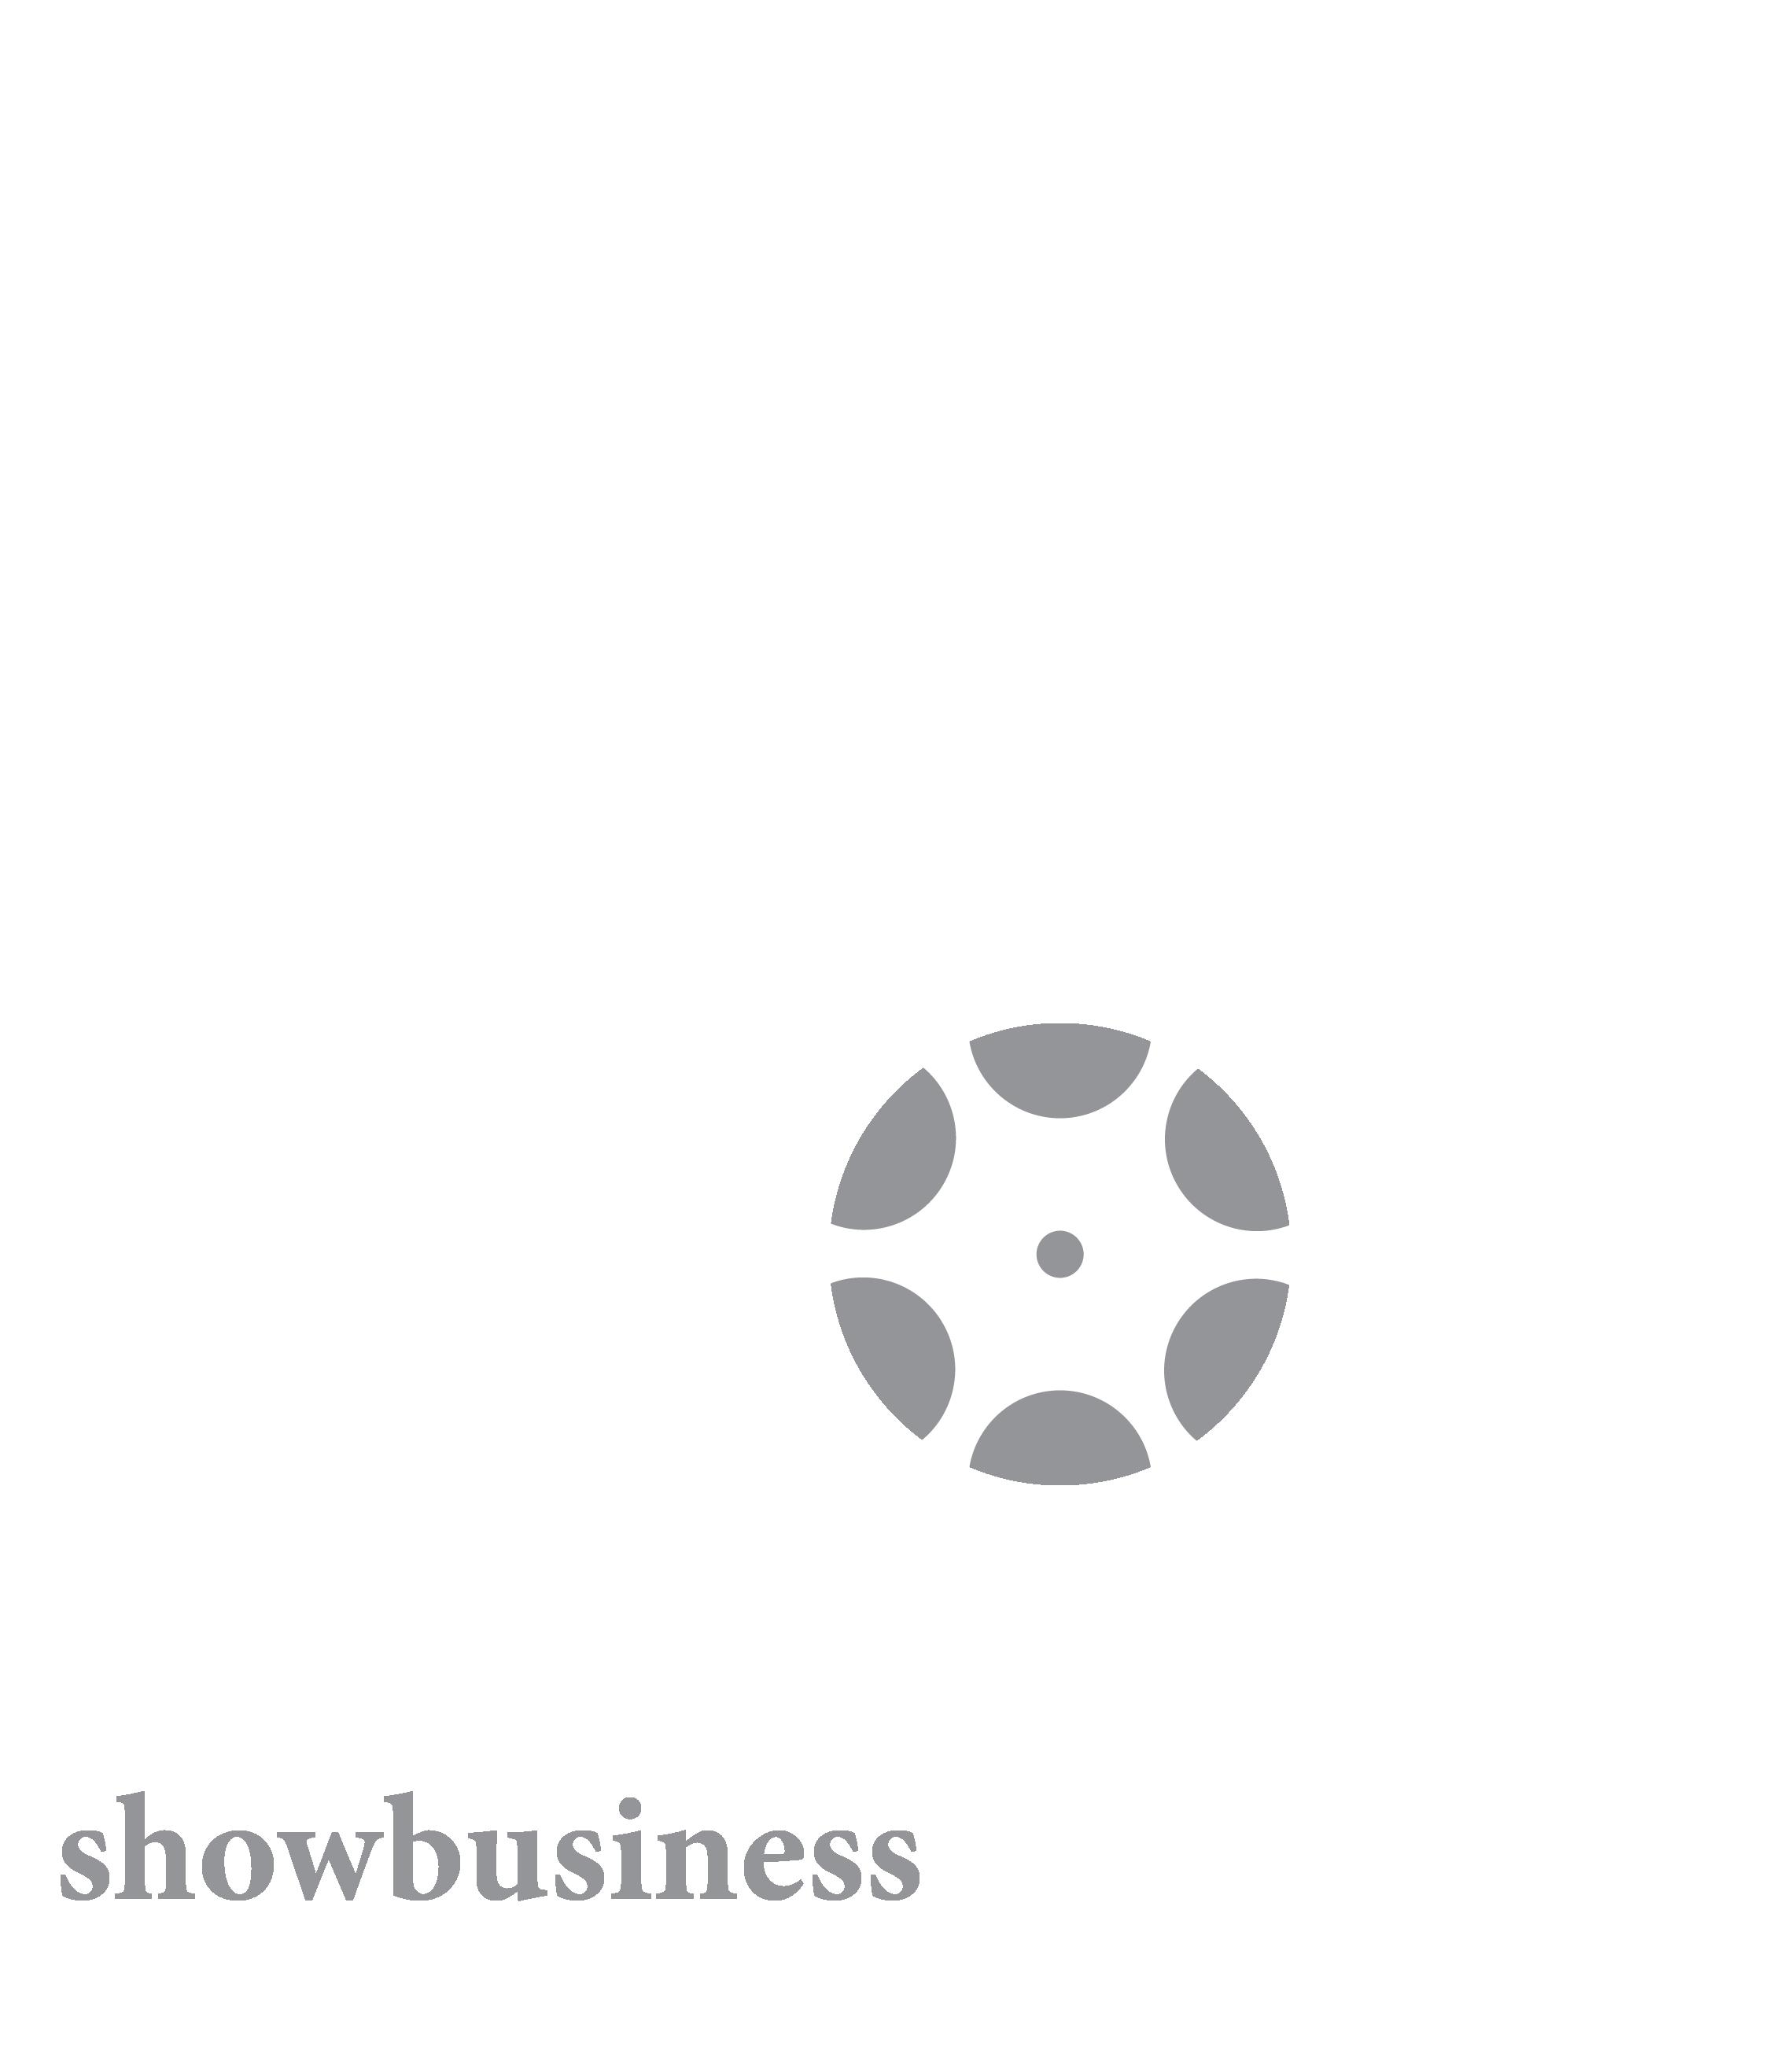 showbusiness international